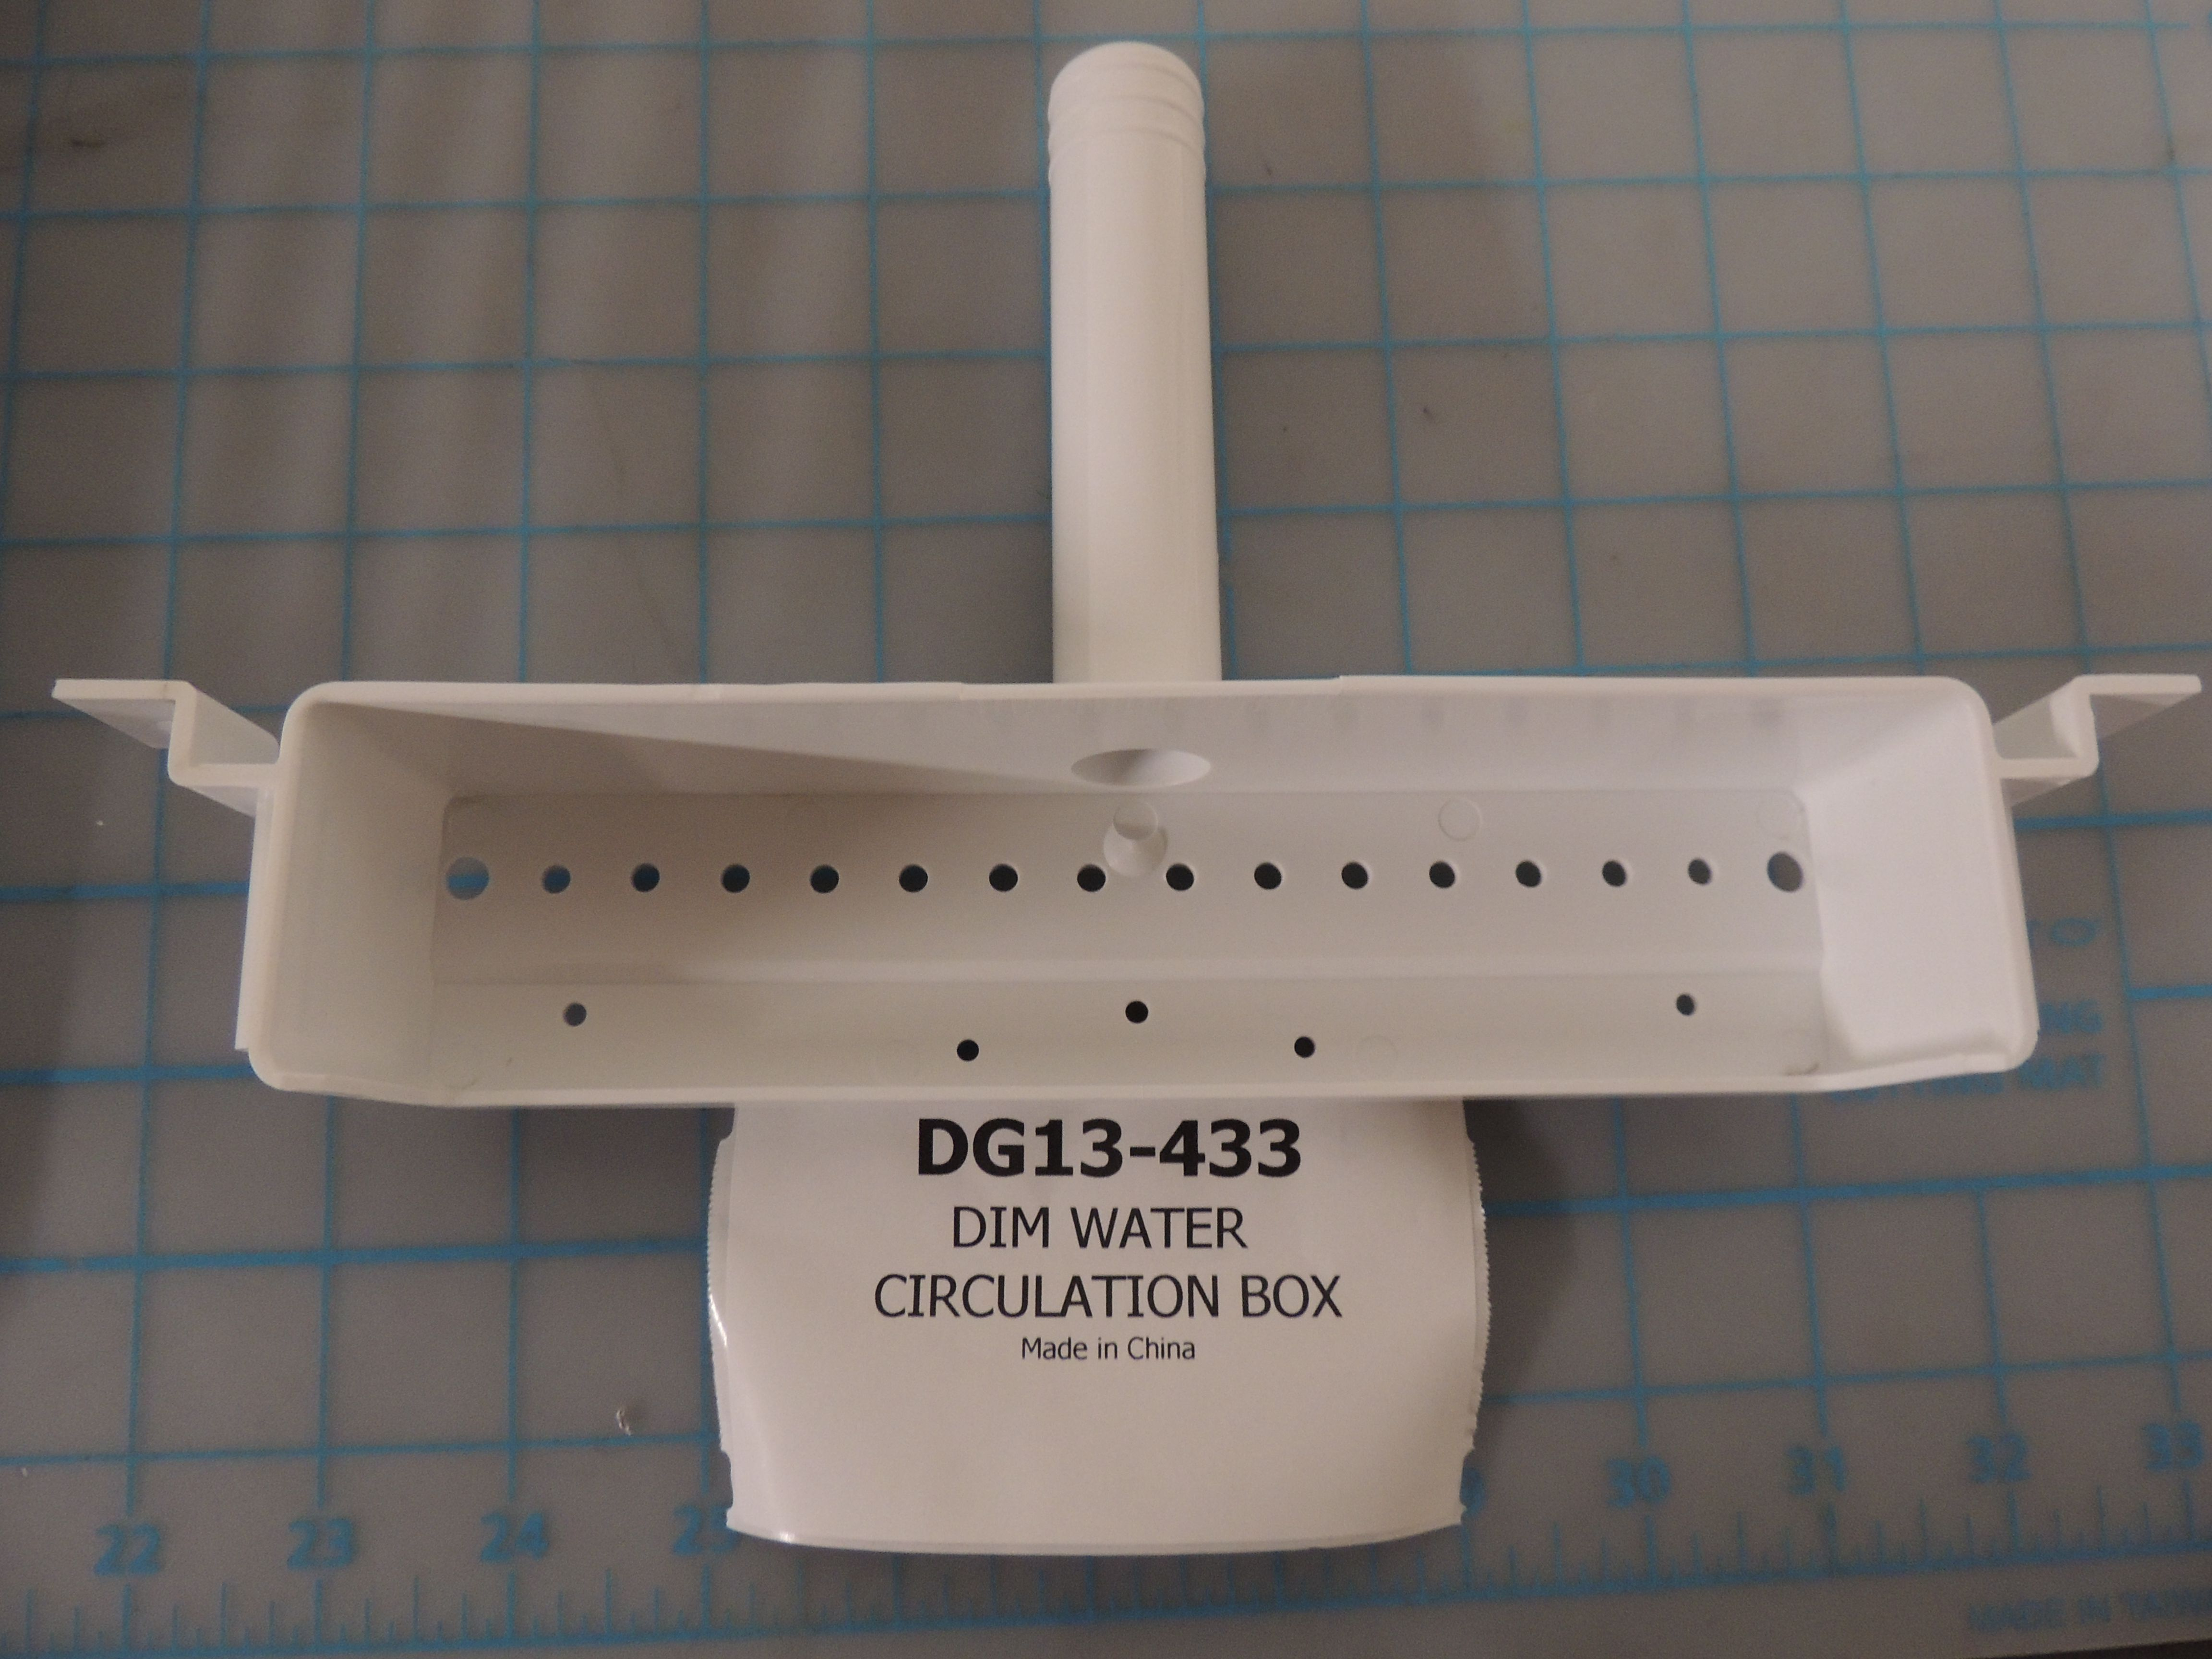 DIM WATER CIRCULATION BOX